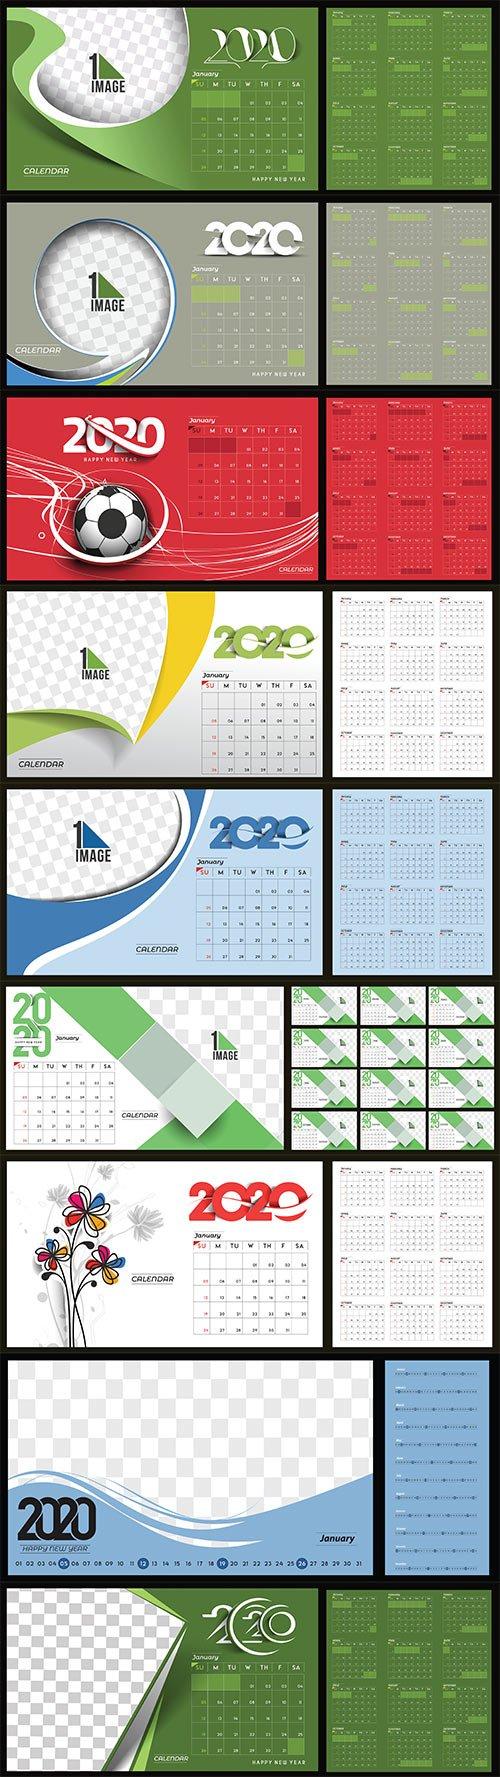 Happy new year 2020 Calendar vector illustration